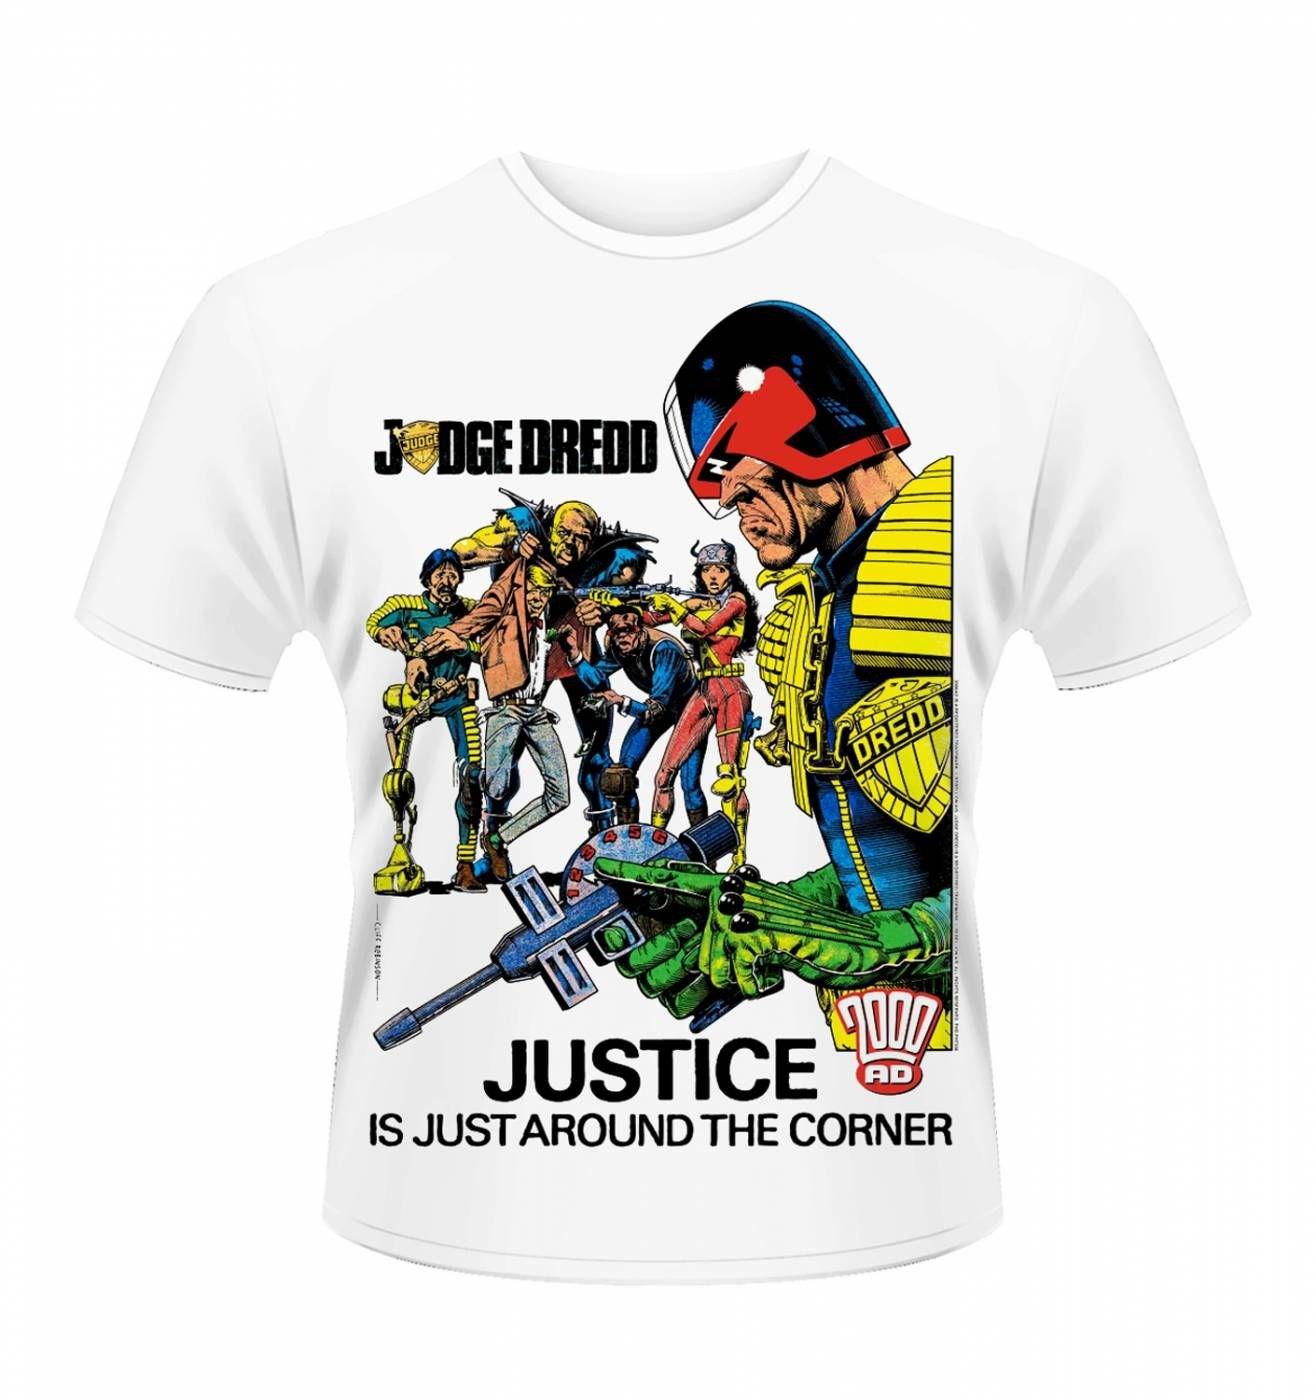 OFFICIAL Judge Dredd justice men's t-shirt